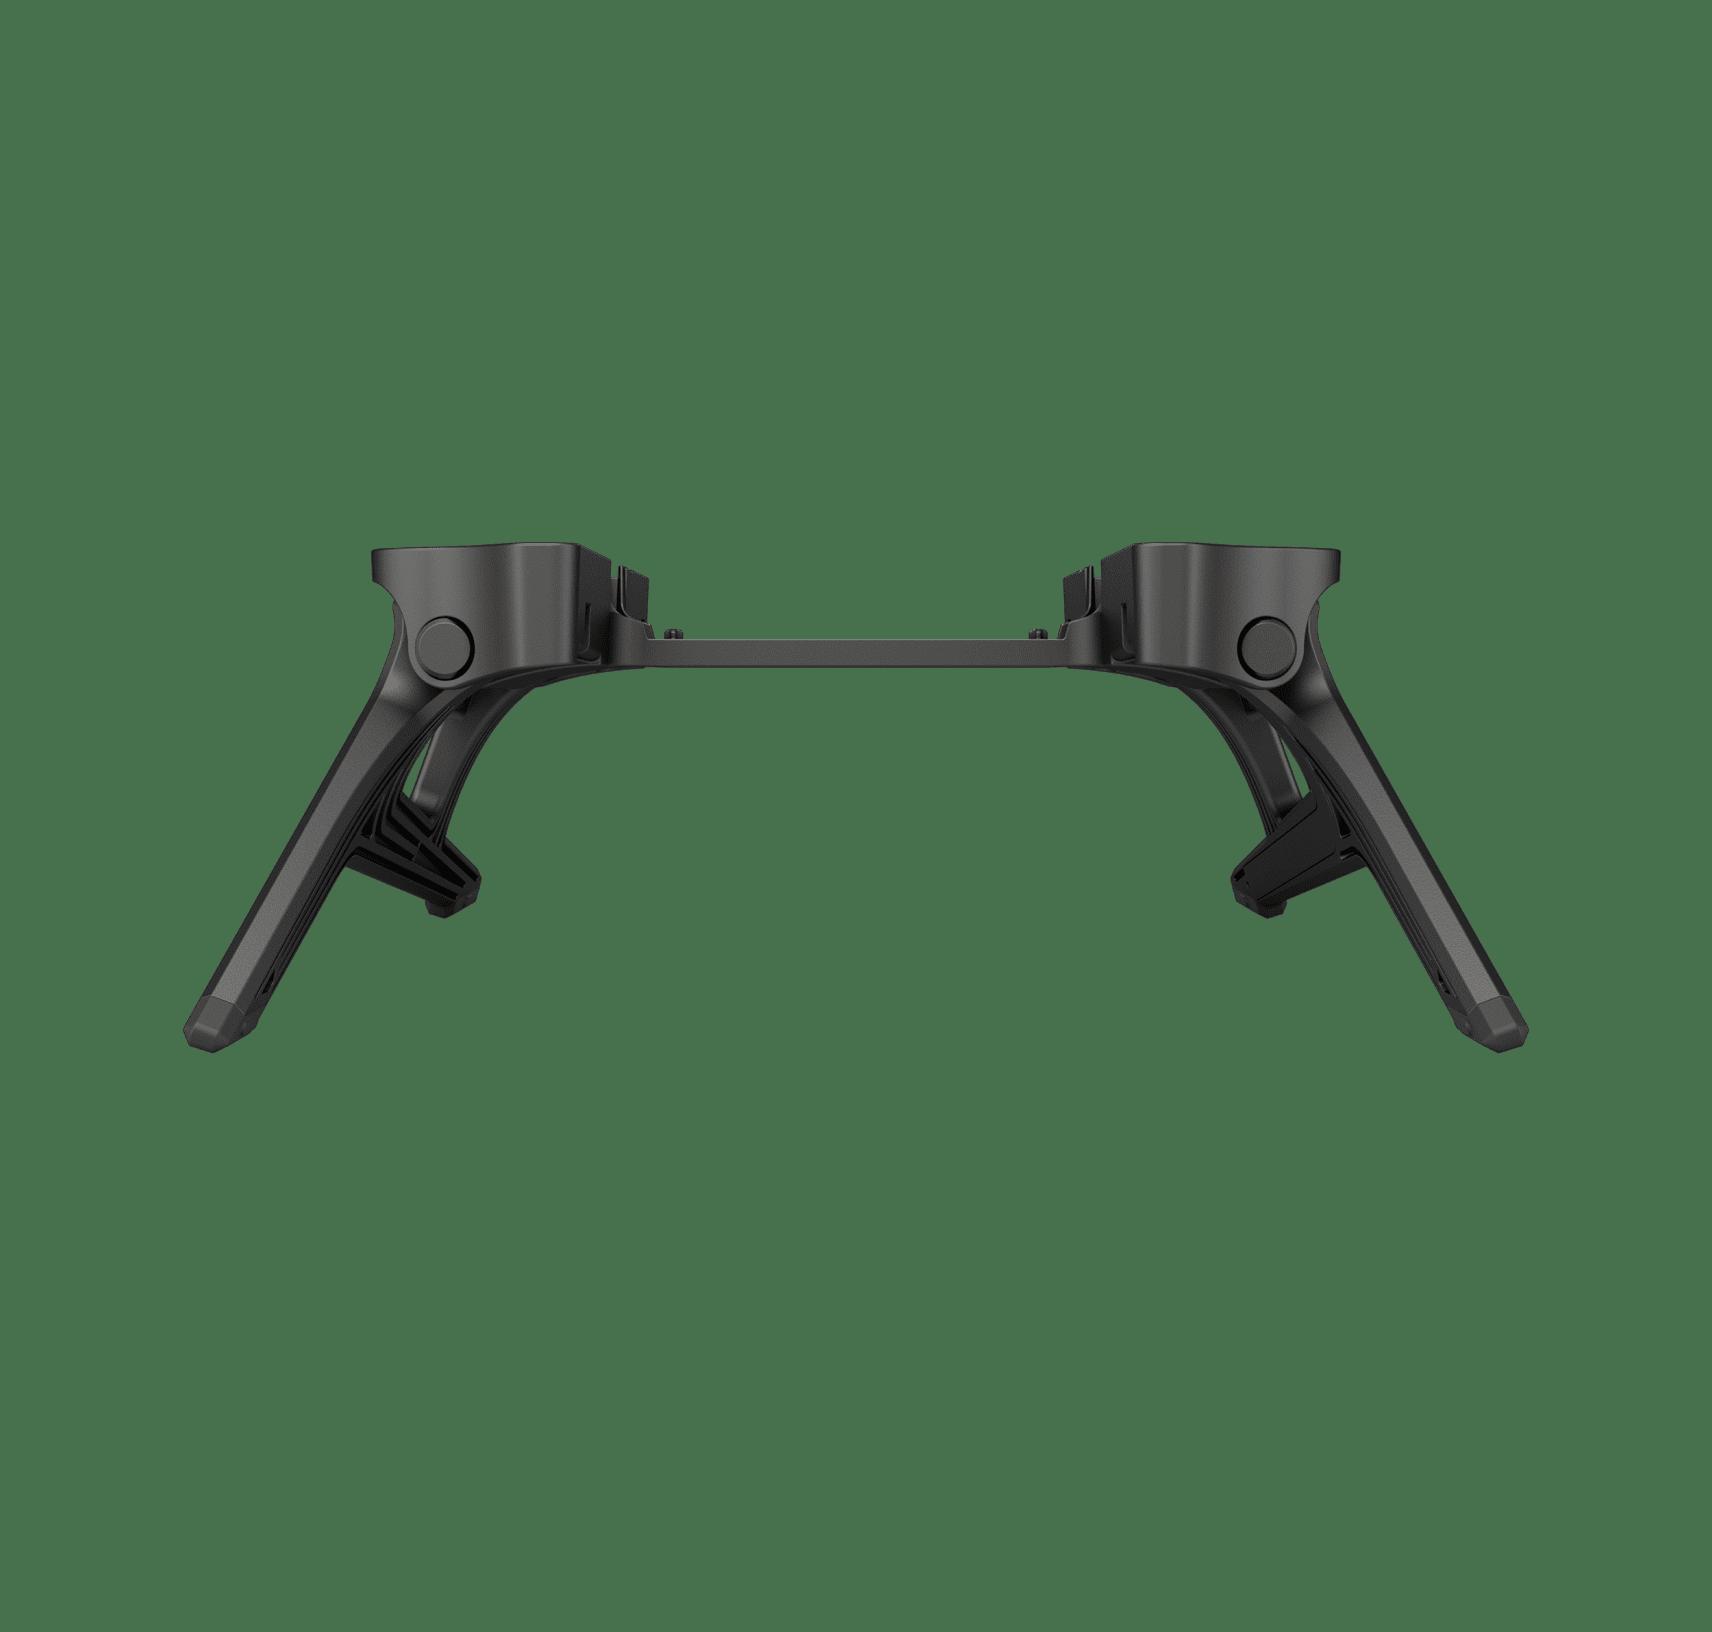 Karma Replacement Landing Gear-front-image